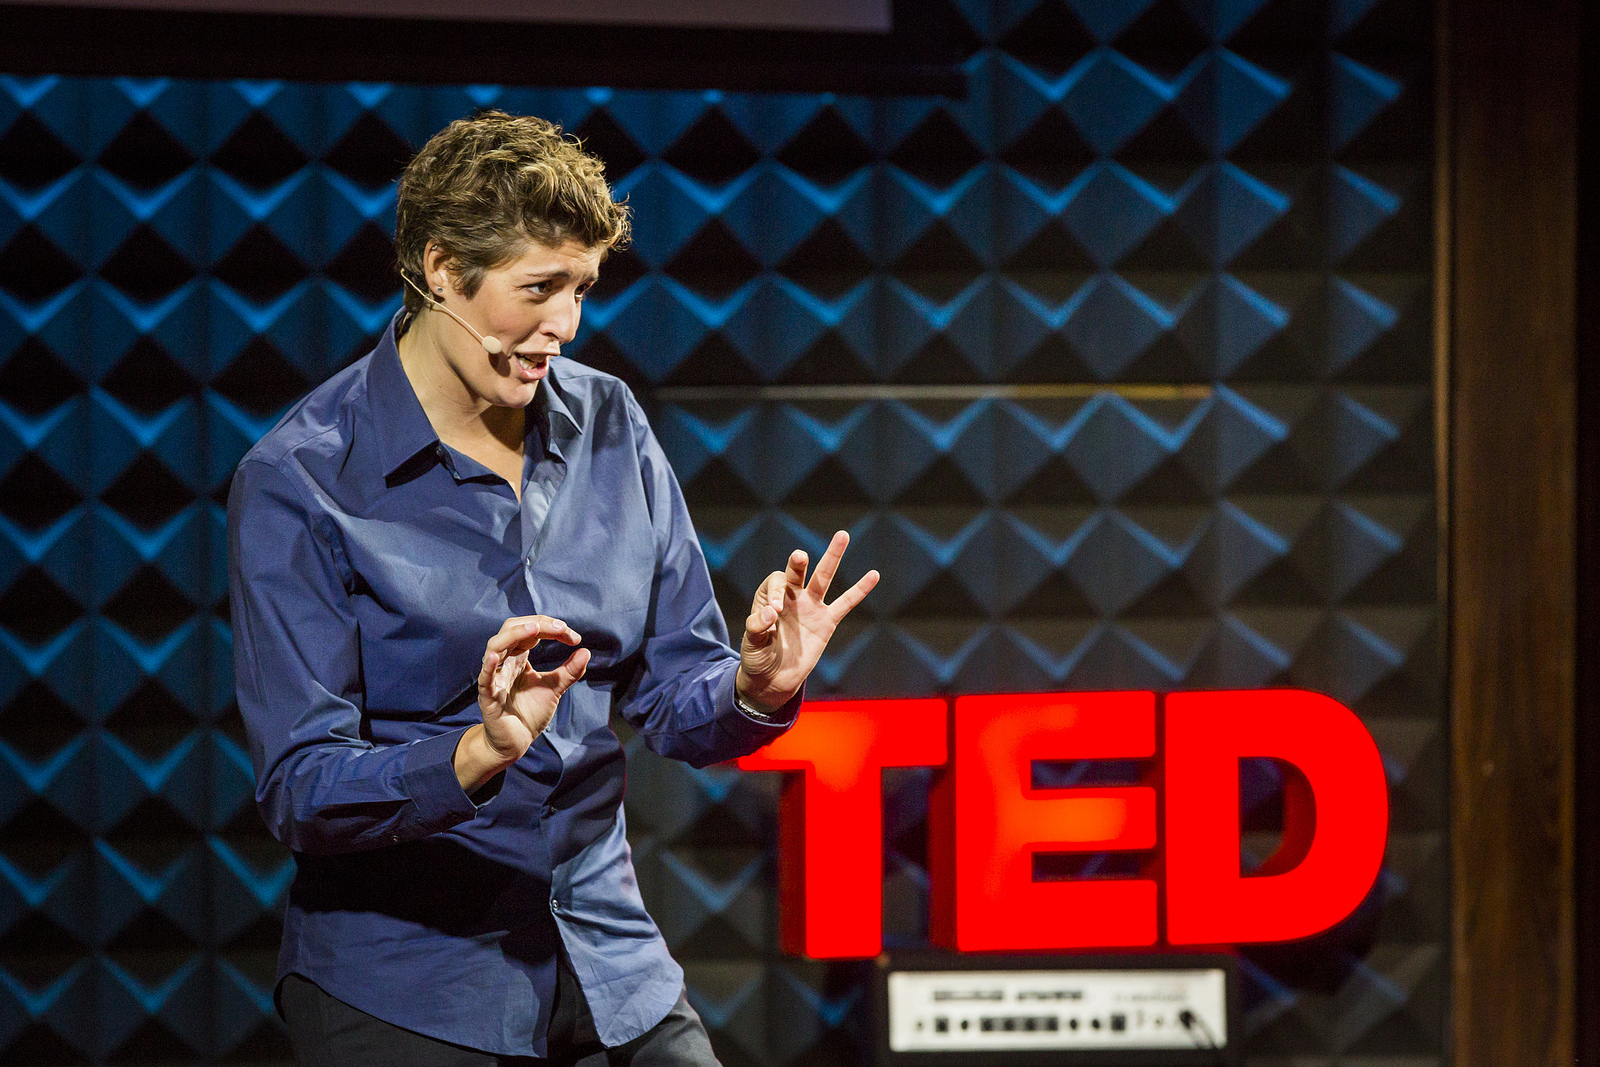 Sally_Kohn_speaks_at_TED@NYC_in_2013